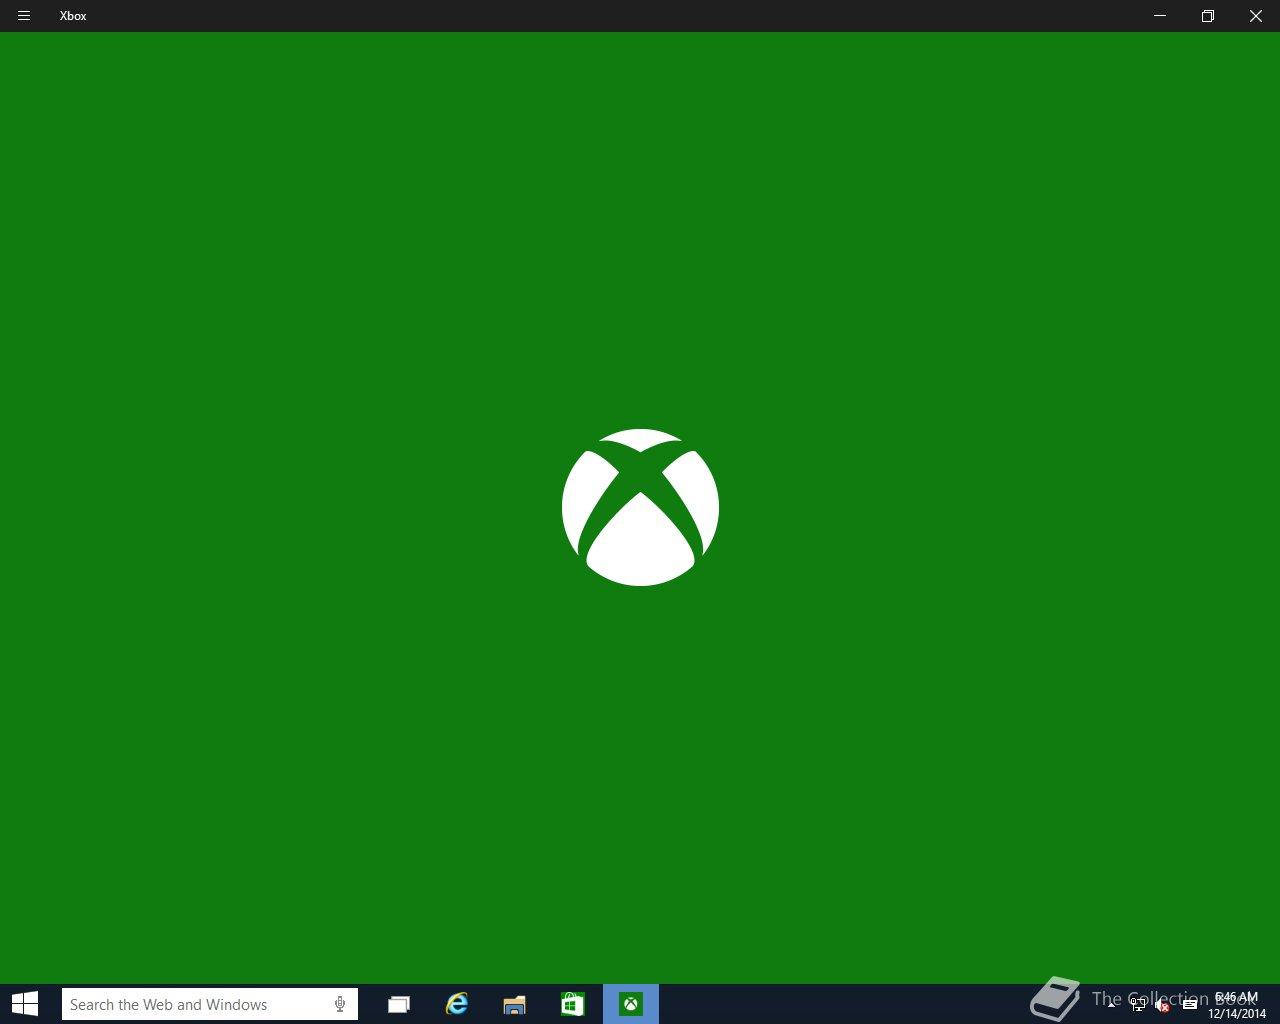 Xbox SmartGlass App - Windows 10